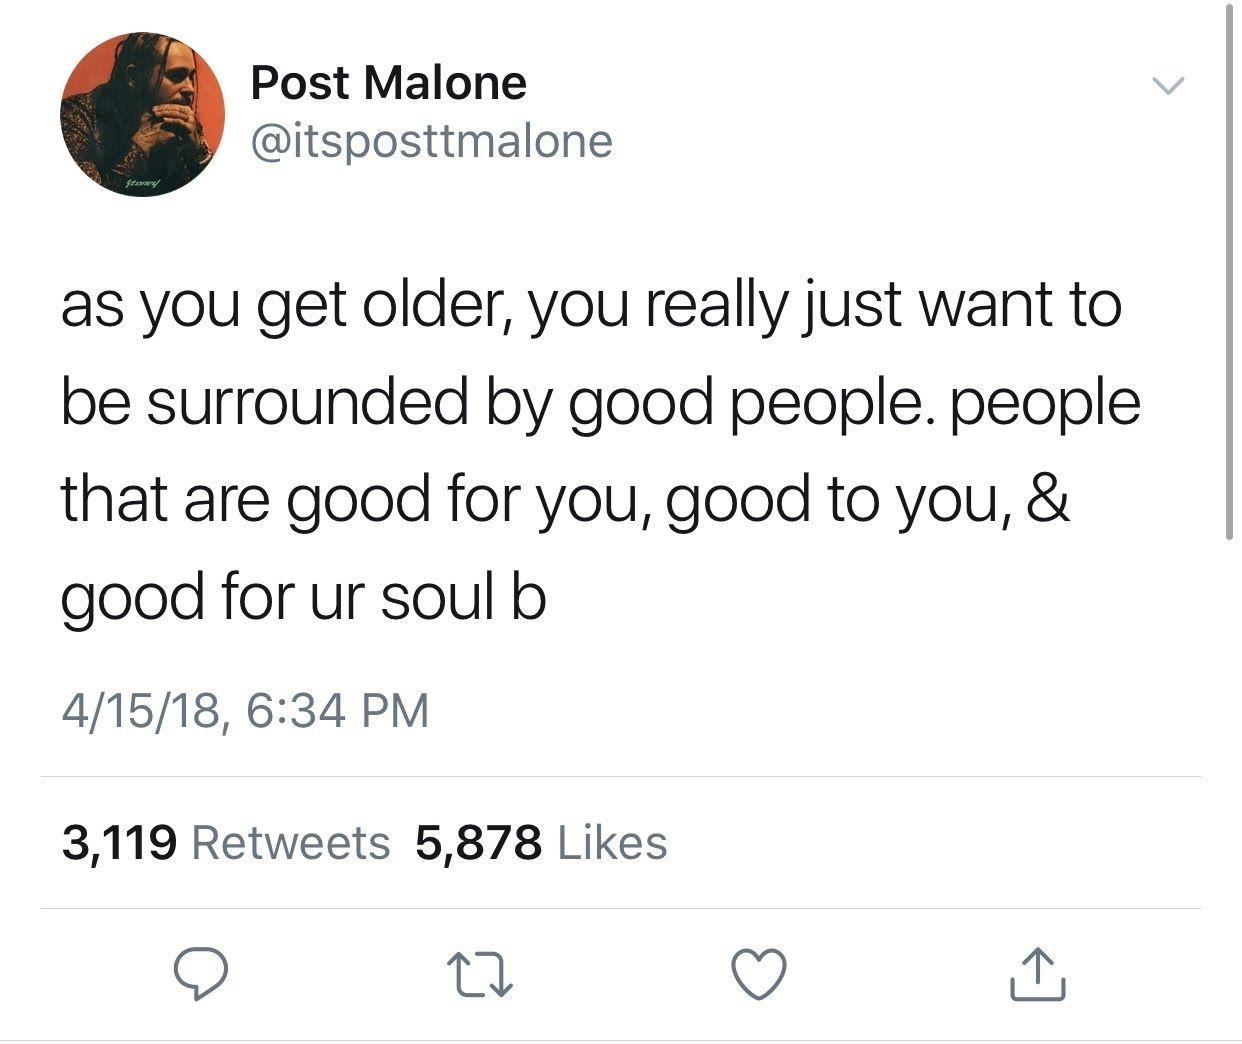 Post Malone's Realest Tweets #postmalonewallpaper